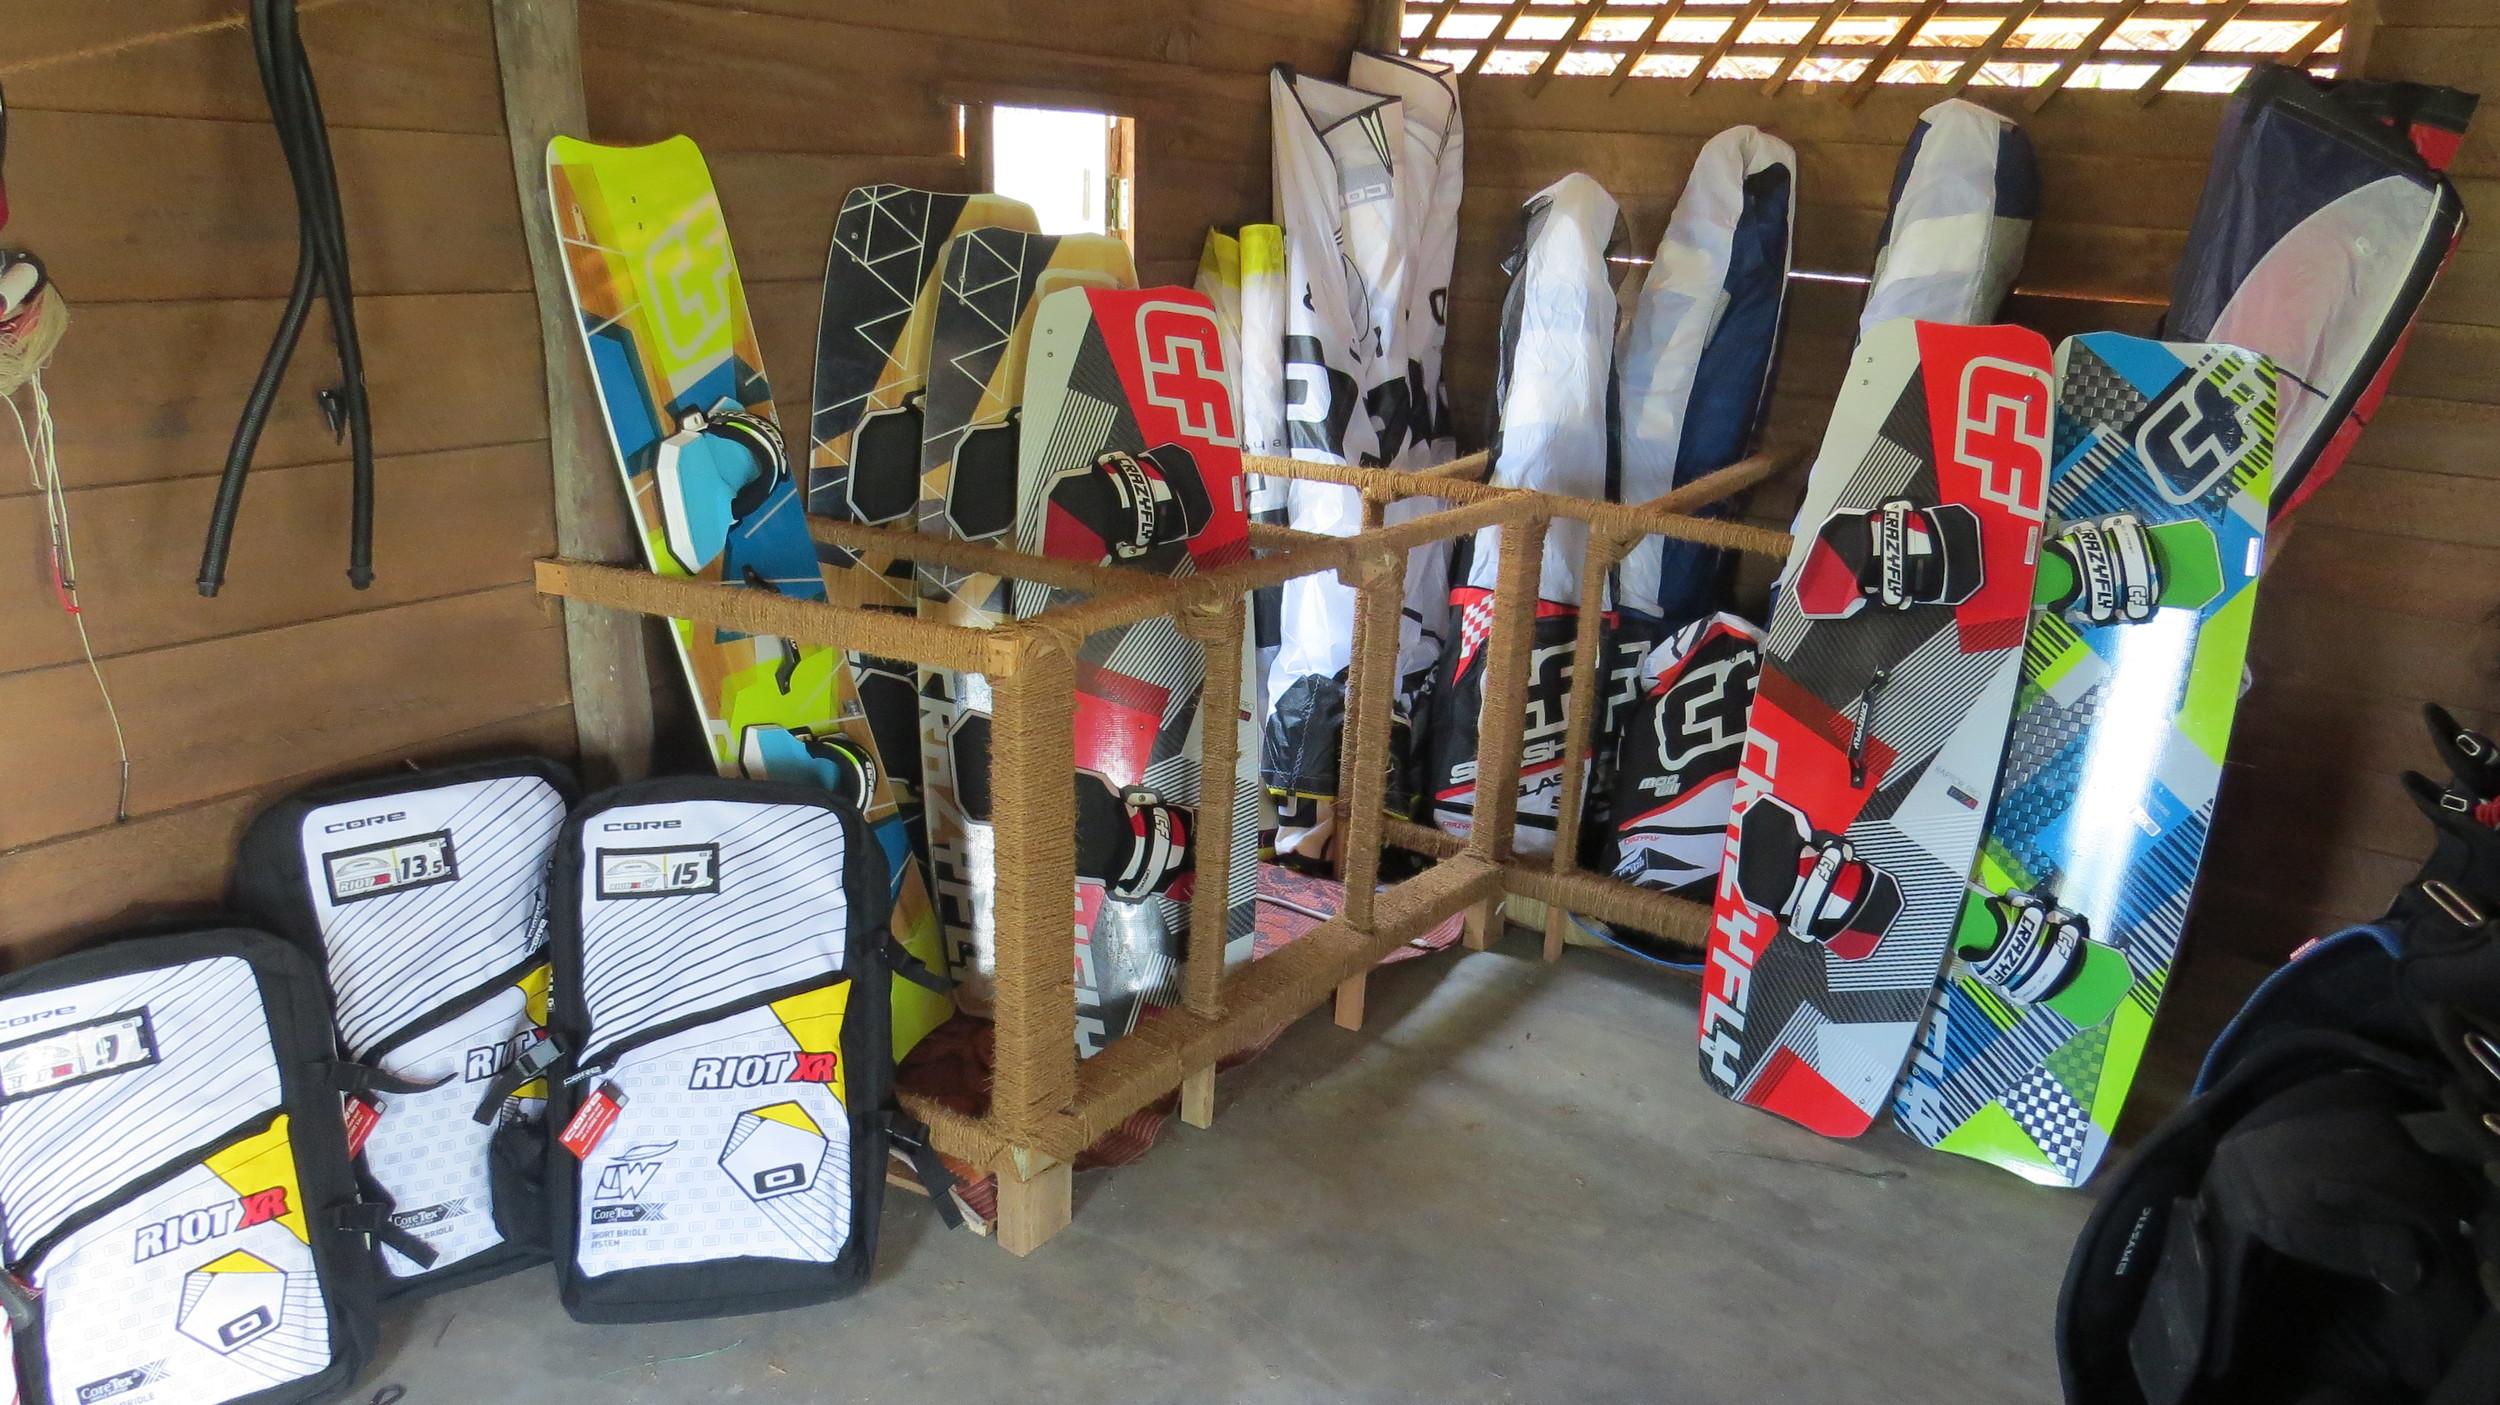 Latest Kite materials